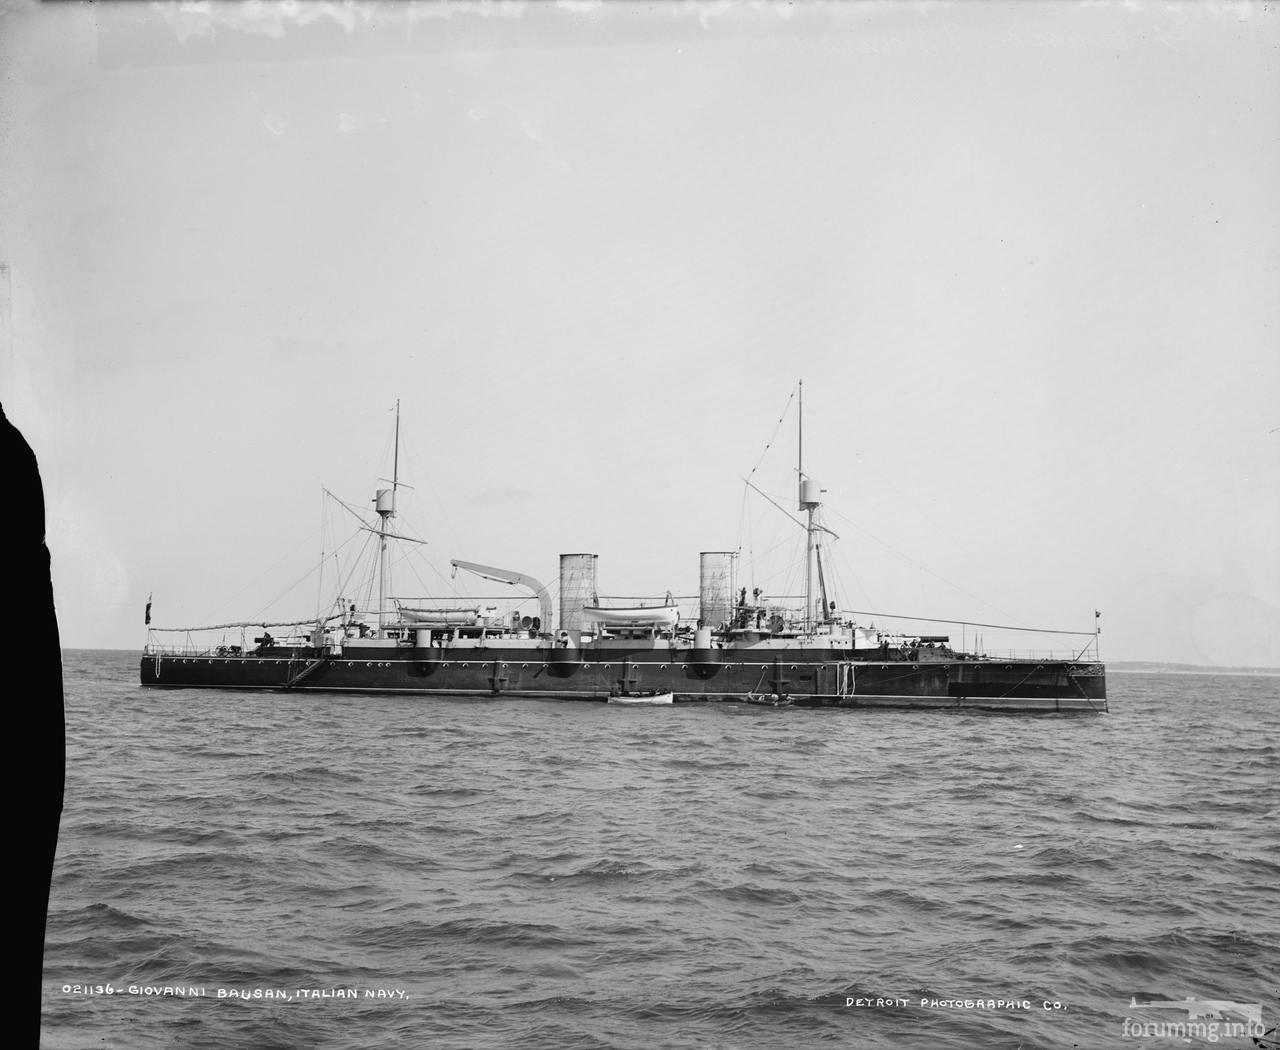 126536 - Бронепалубный крейсер Giovanni Bausan